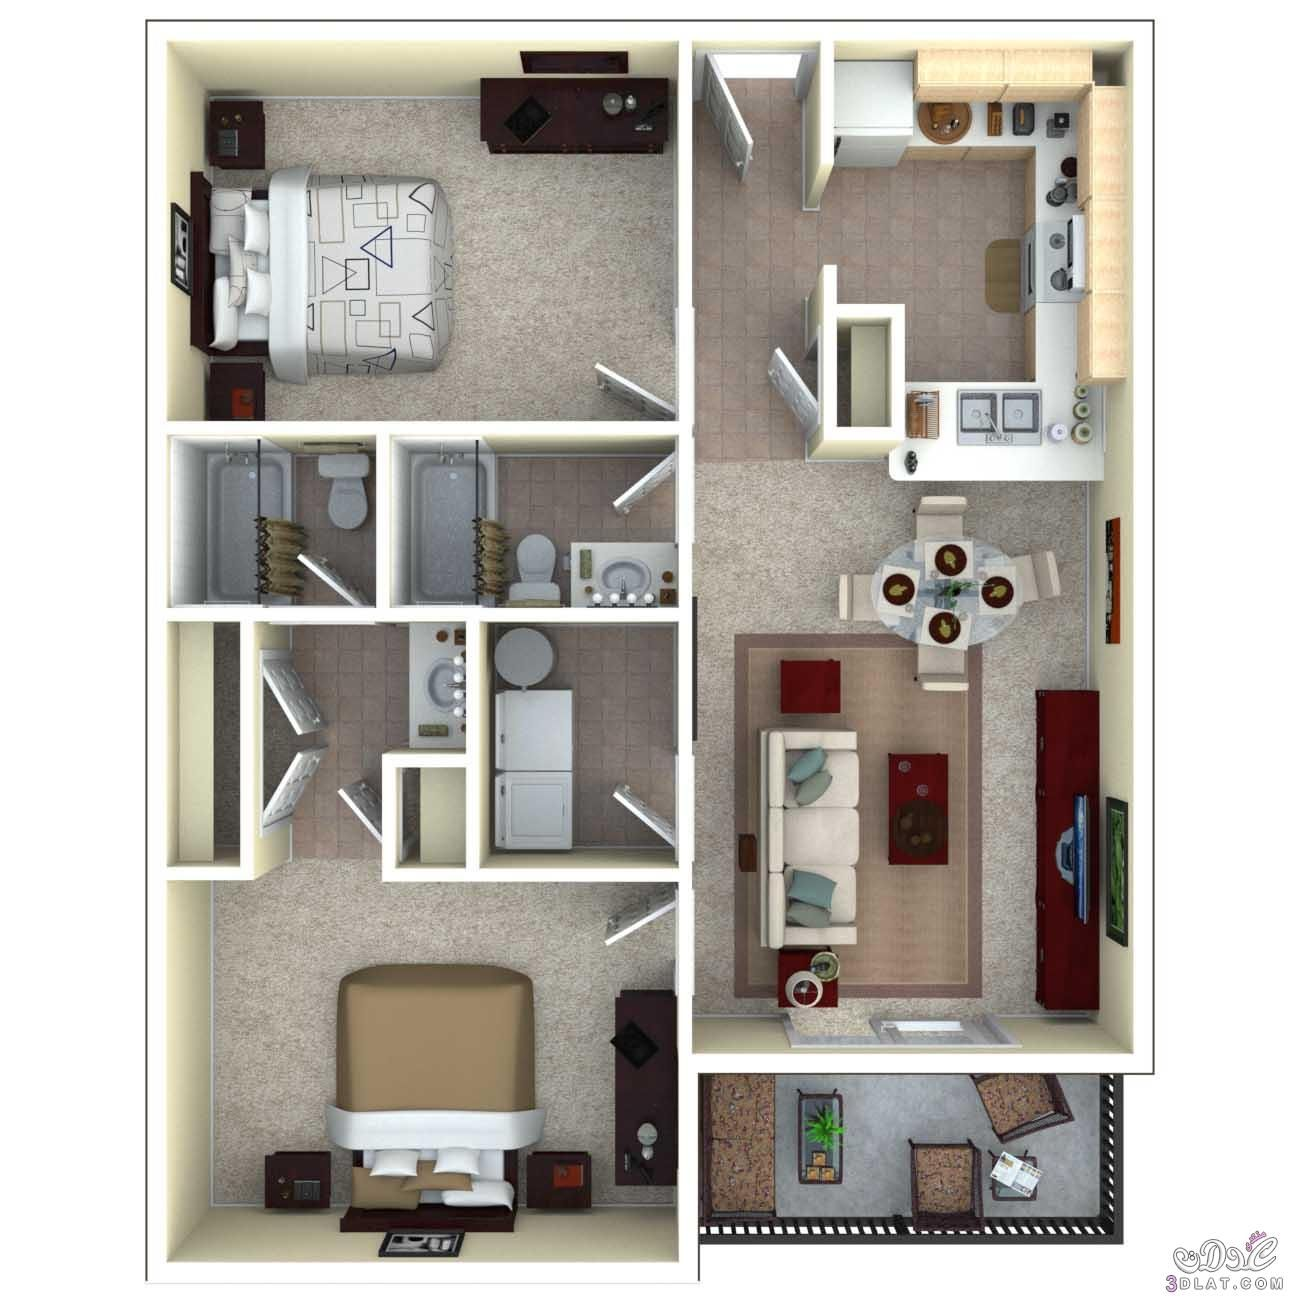 صور خرائط وتصاميم منازل و شقق مساحات صغيرة ومتوسطة تصاميم بيوت صغيرة مخططات منازل 1300 X 130 Home Design Software Best Home Design Software Cool House Designs